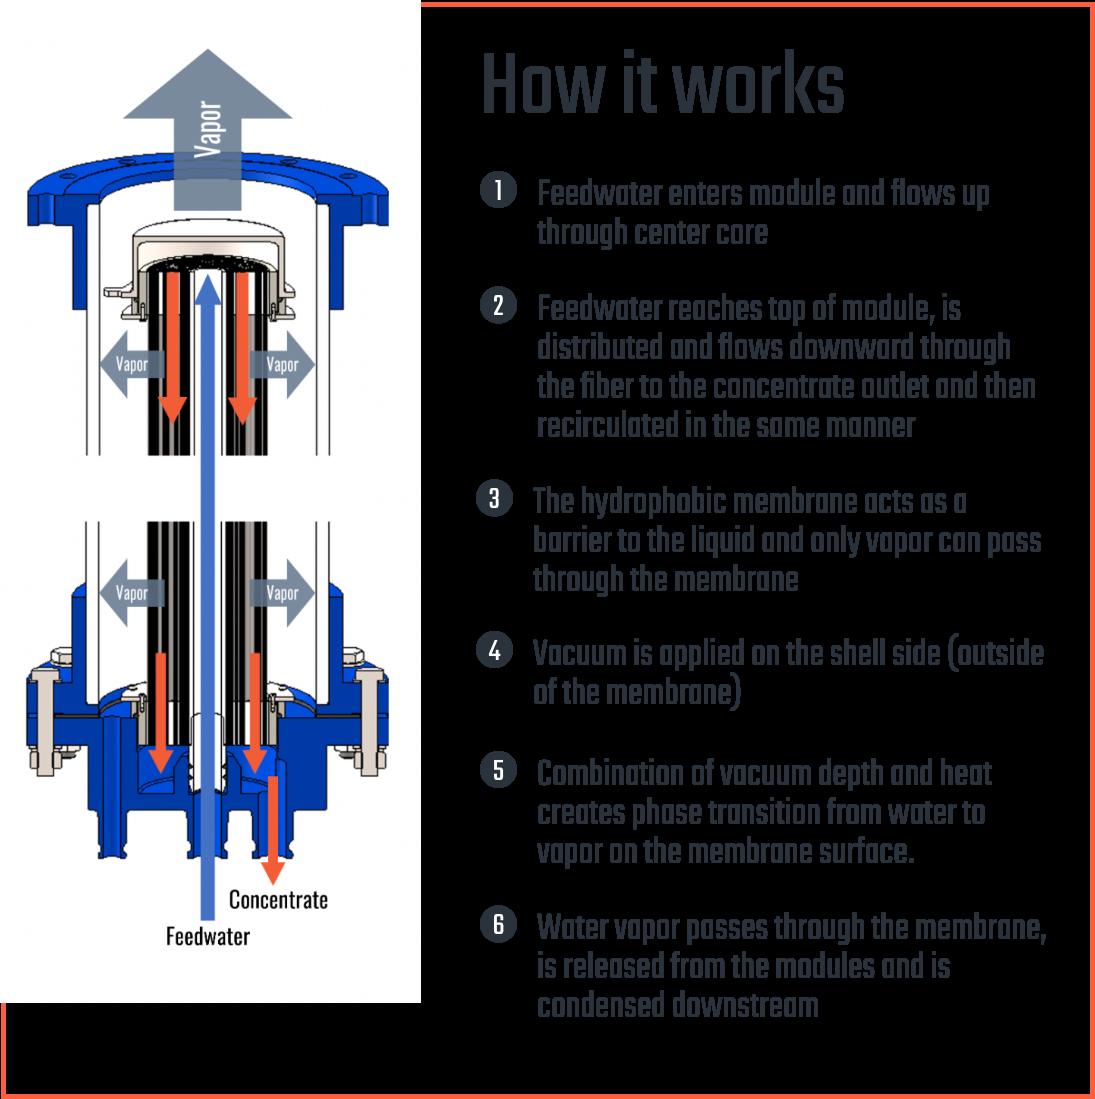 waste water breakdown - how it works